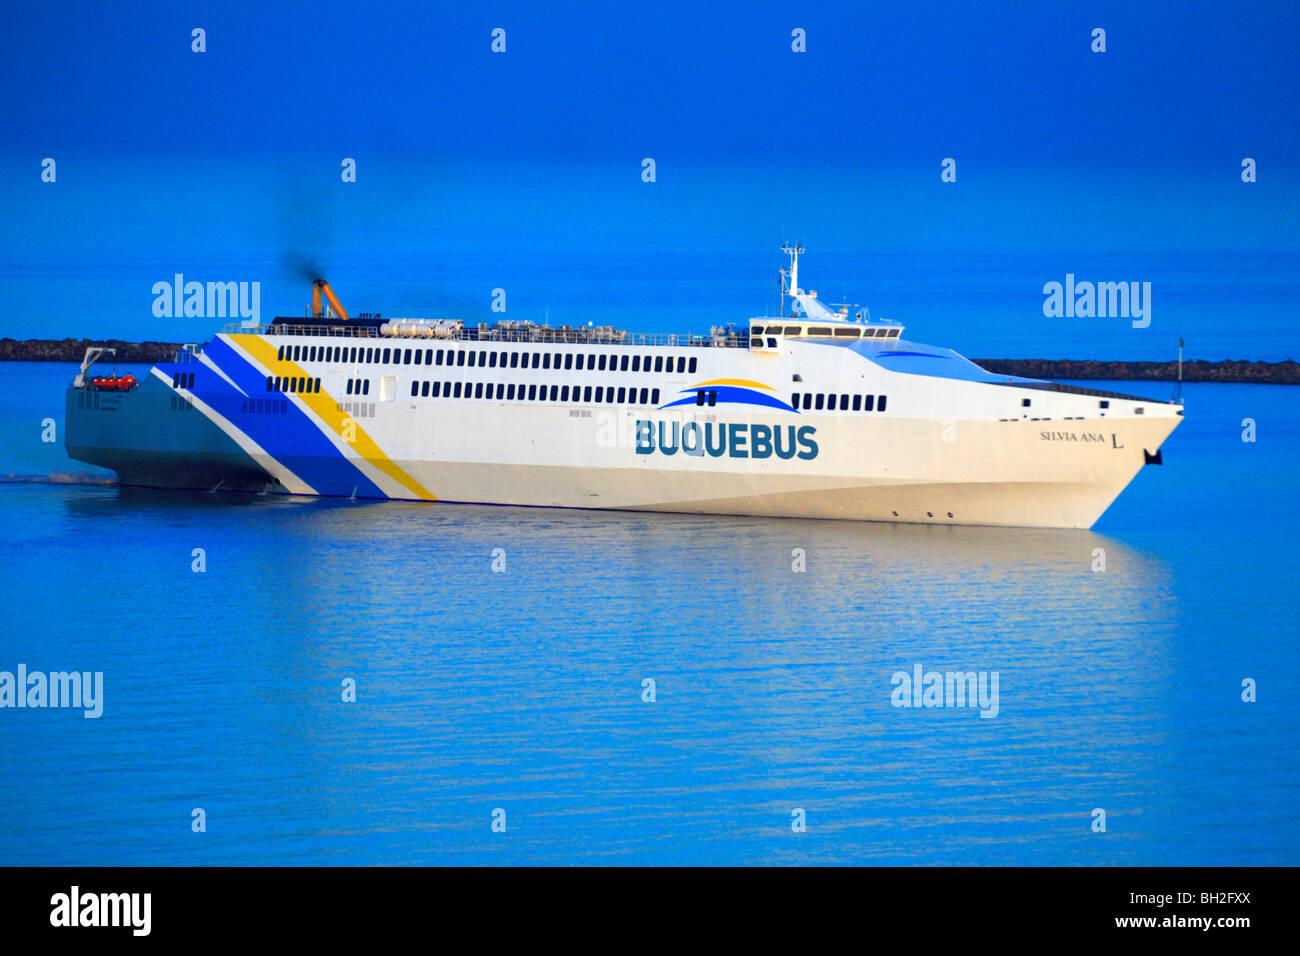 Buquebus ferry ship arriving to Colonia del sacramento coast. urugauy, south america - Stock Image